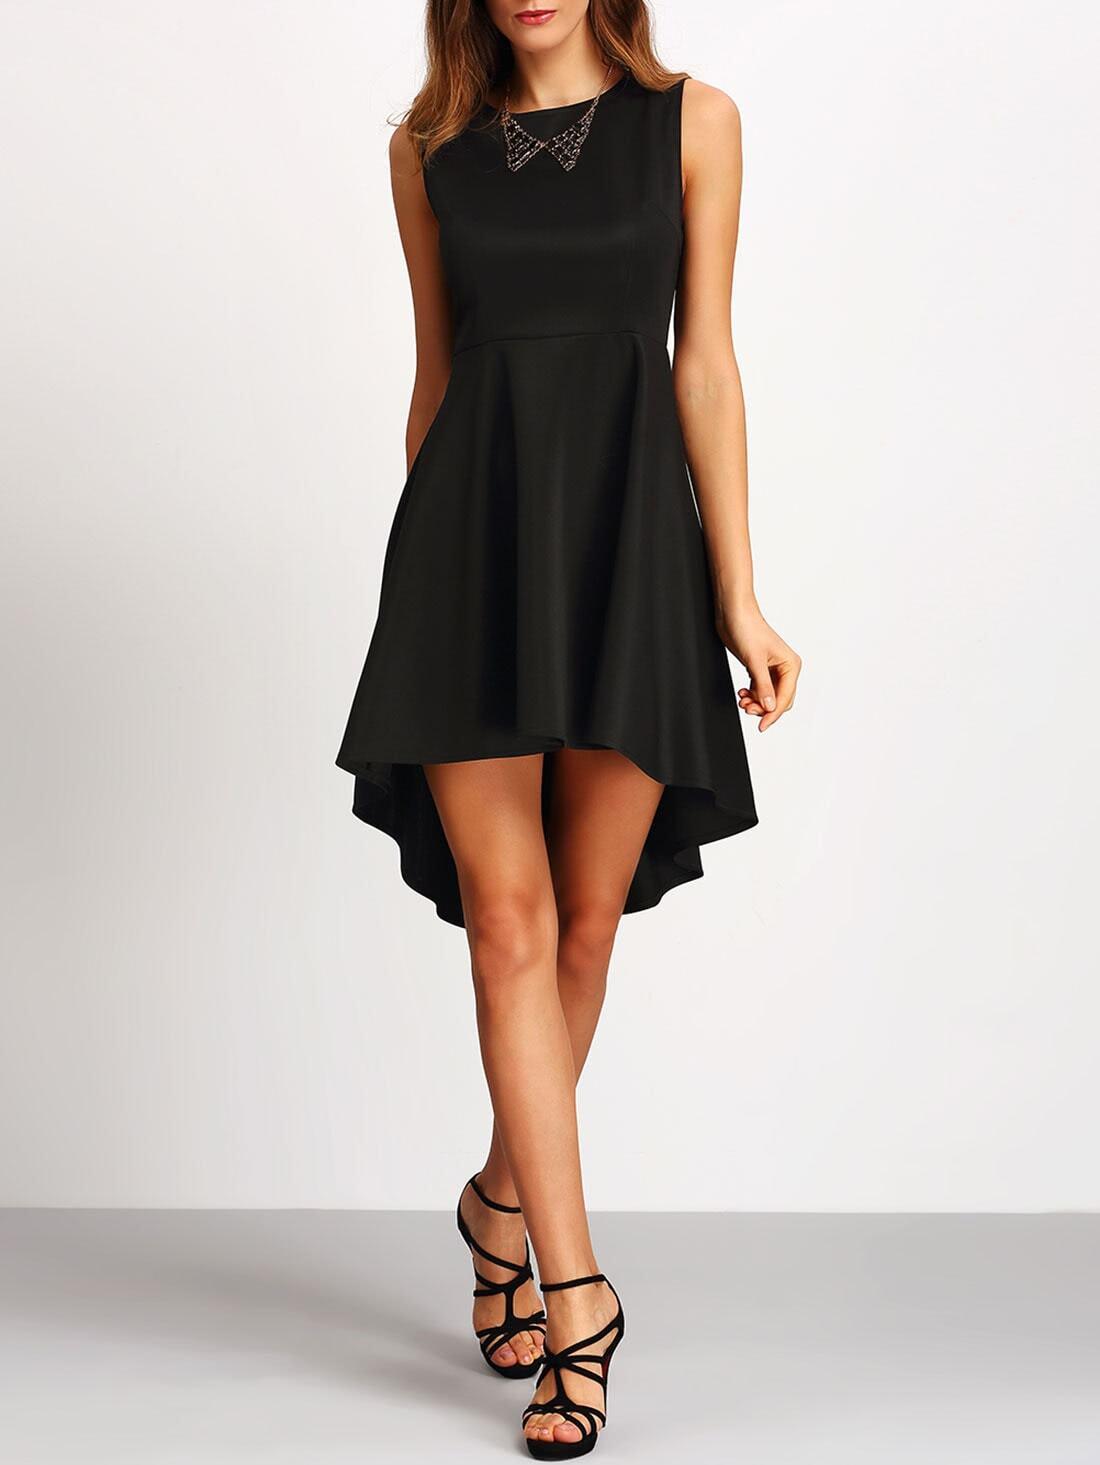 Black Sleeveless Asymmetrical Dress